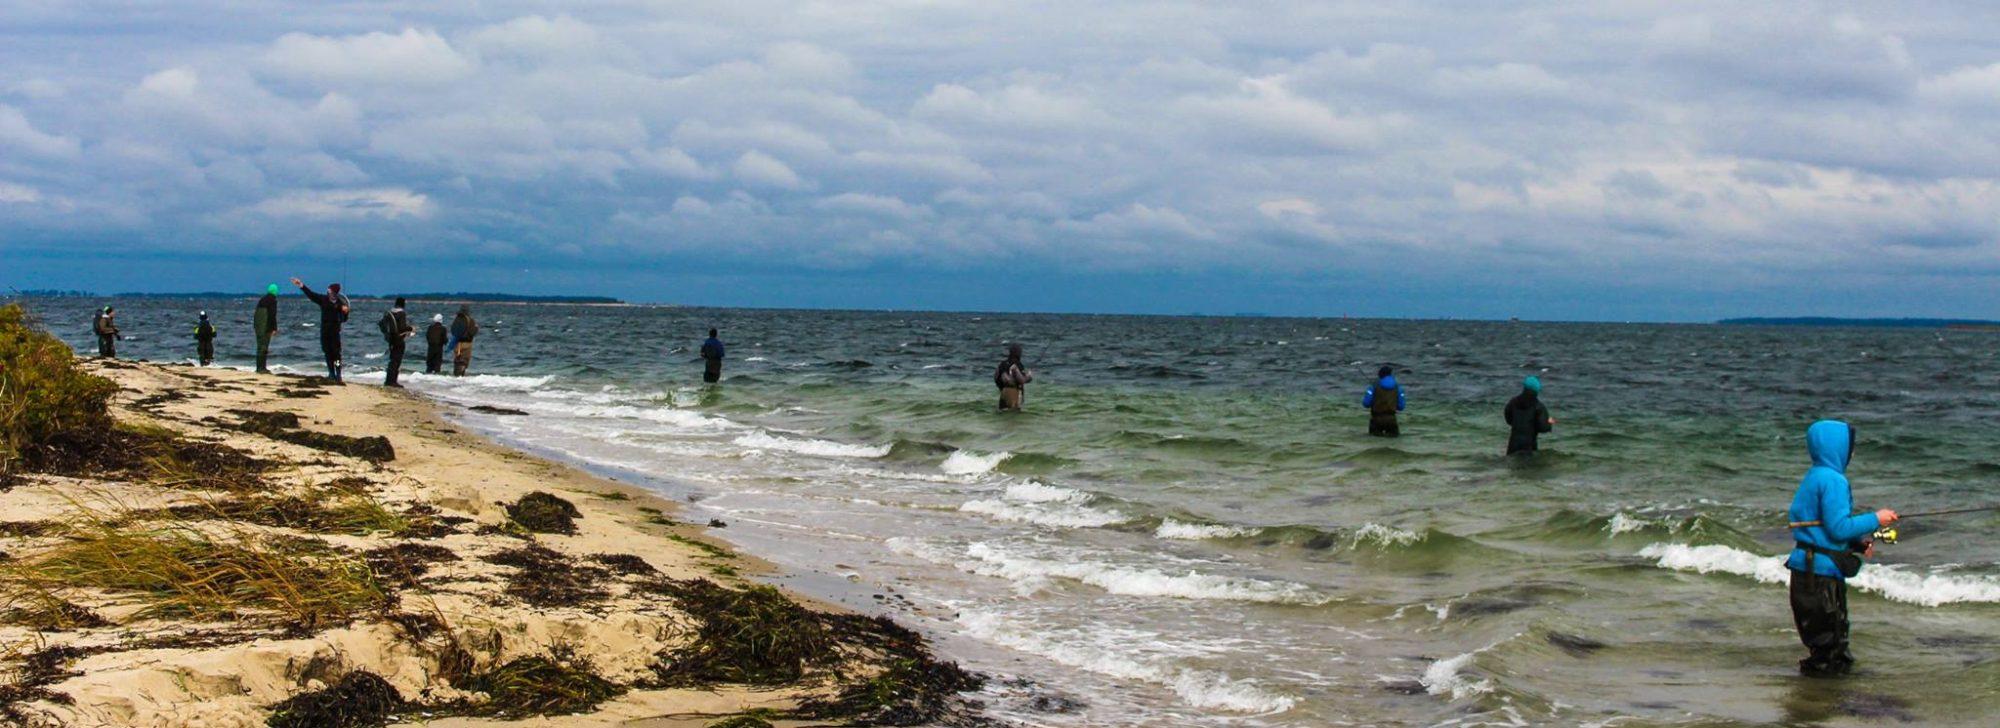 HSTE-Fishing – Offizielle Webseite